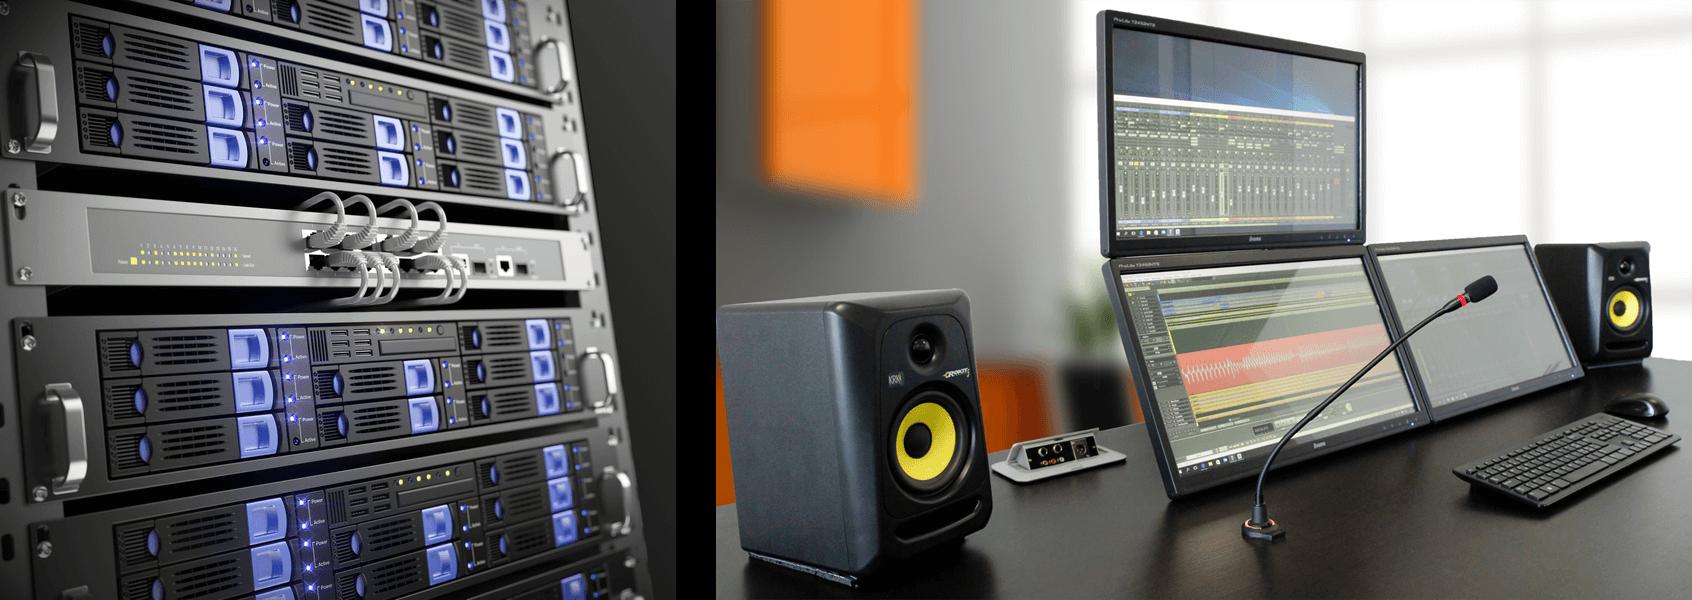 Telefon Tonstudio Serverrack im tonstudio